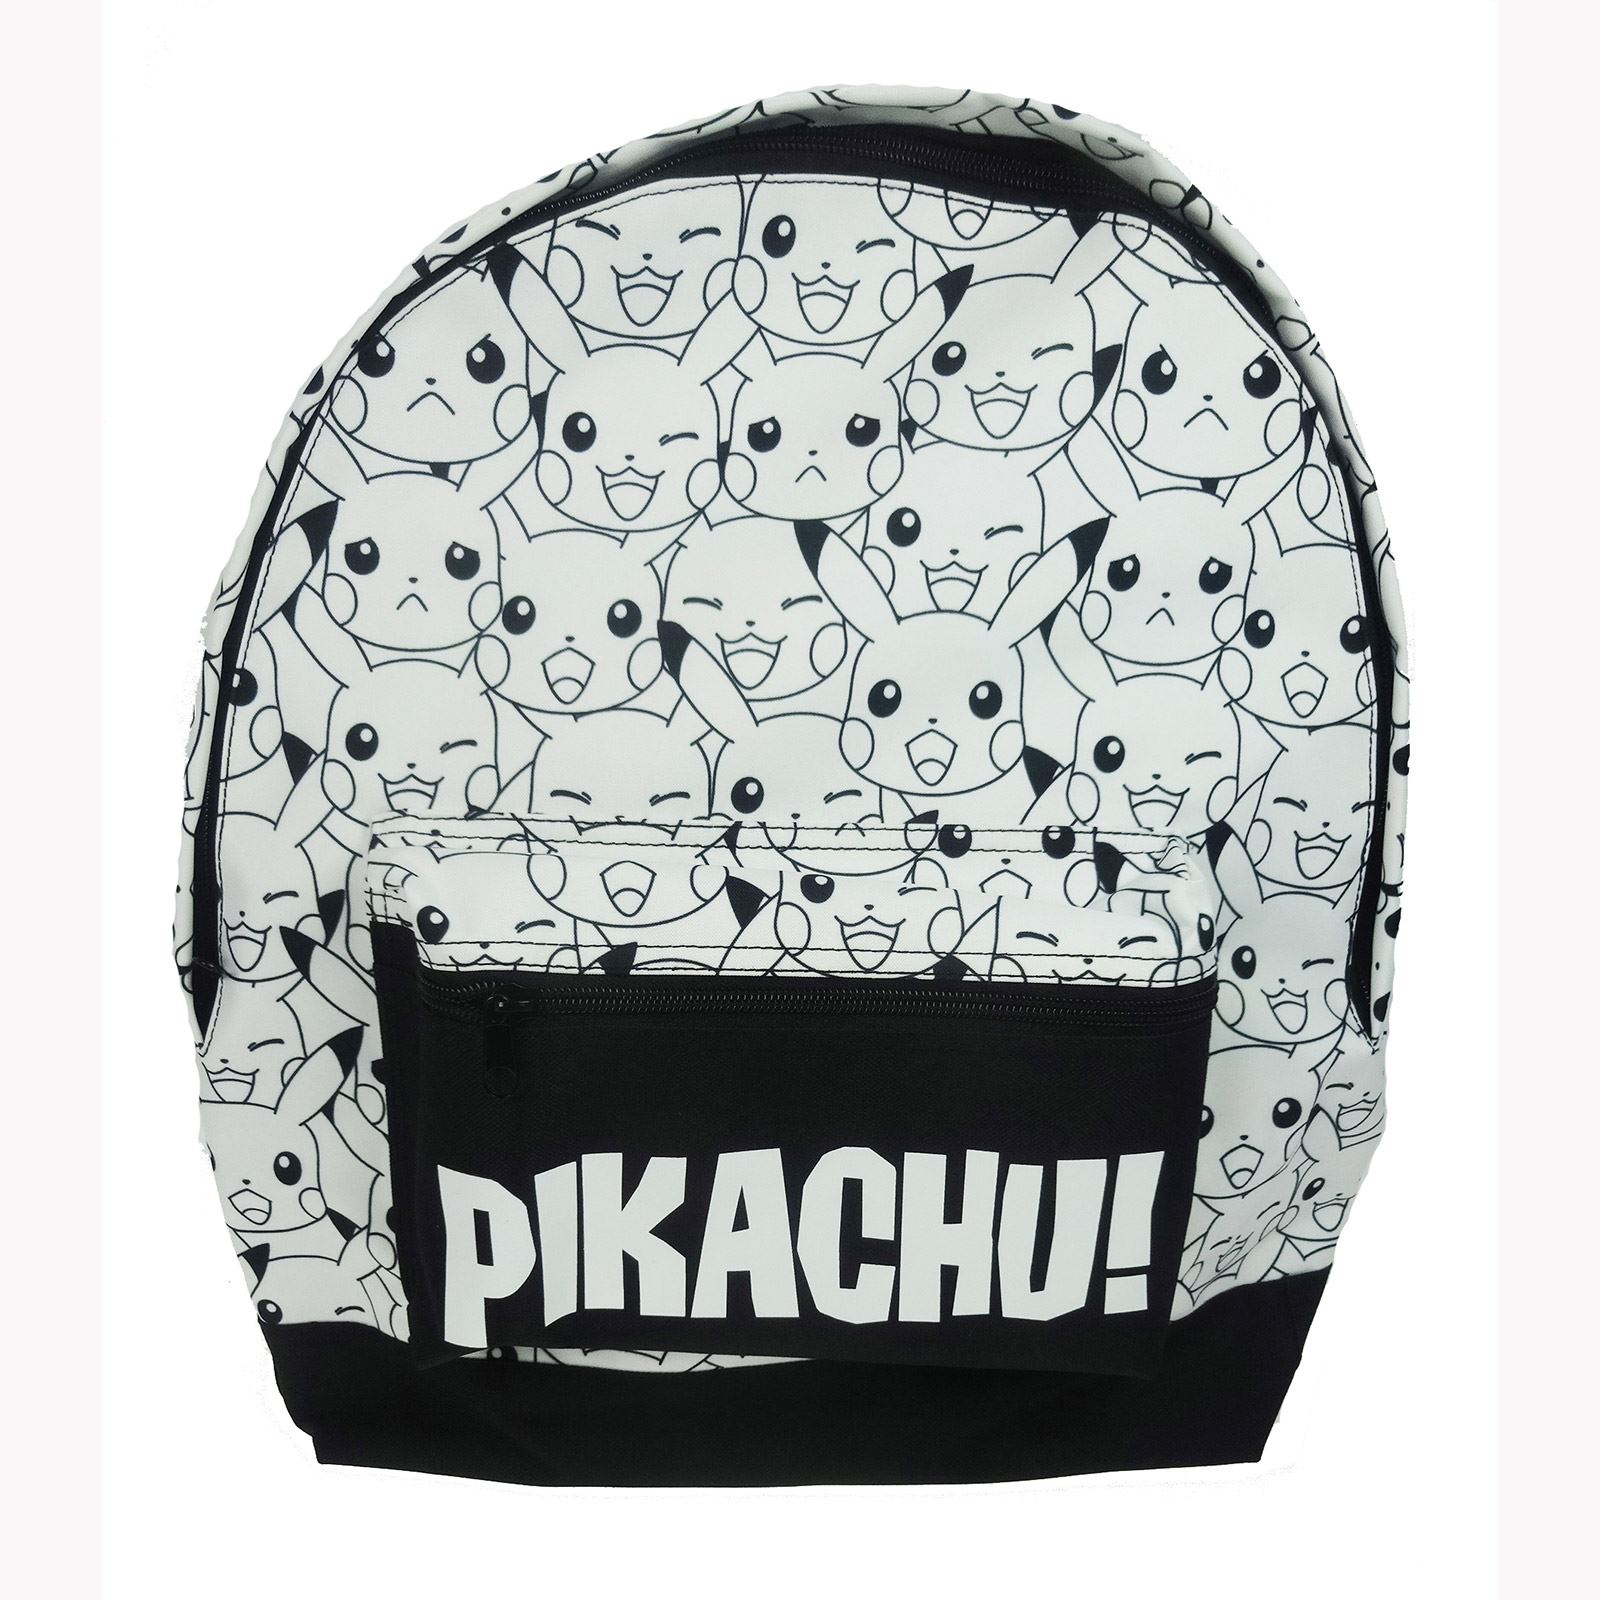 Pokemon Pikachu Sac 224 Dos Sac 233 Cole Neuf Noir Et Blanc Ebay